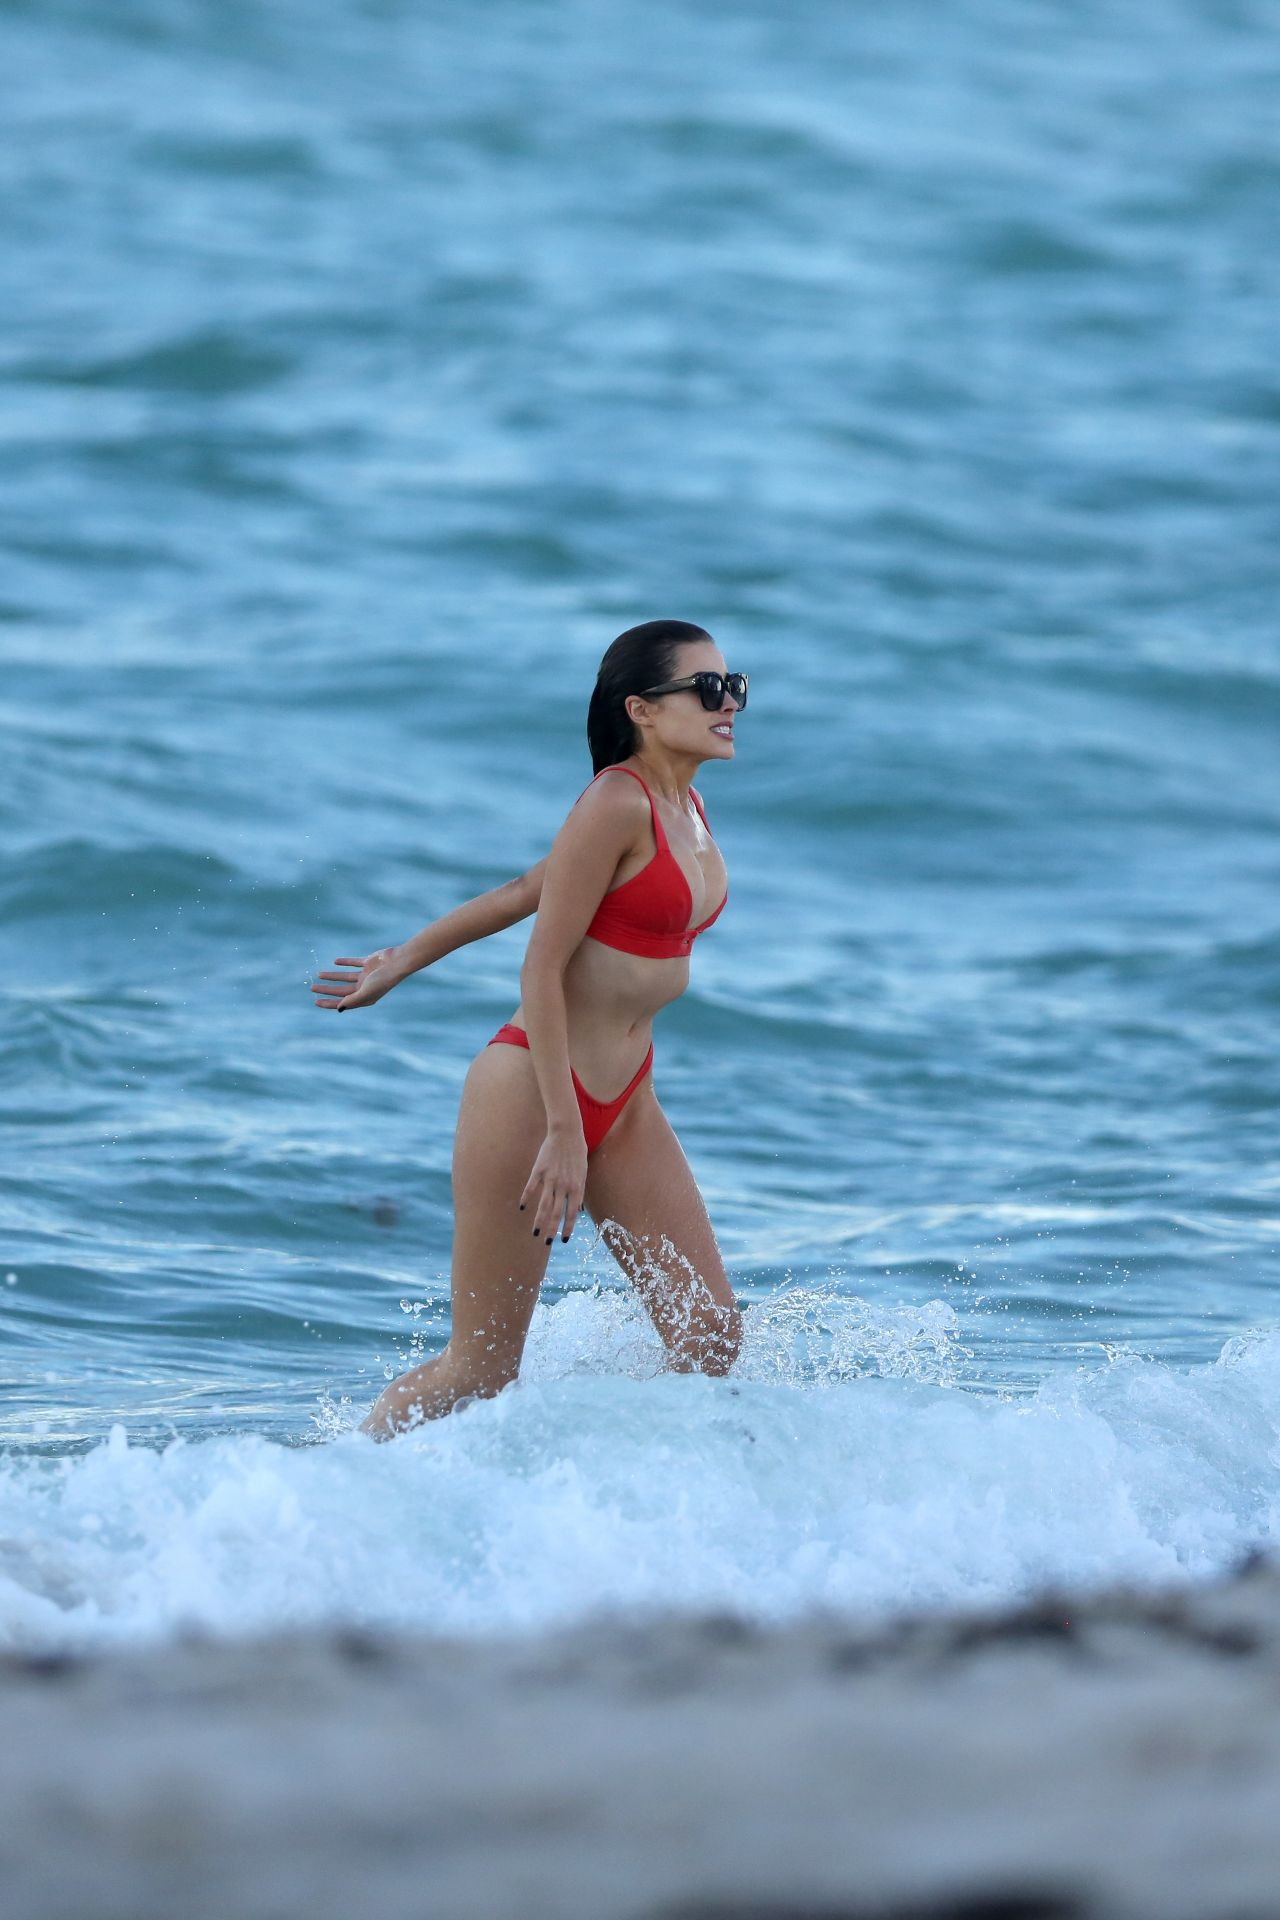 Shanina Shaik Caroline Lowe Olivia Culpo and Daniela Braga in Bikini Photoshoot in Miami Beach Pic 1 of 35